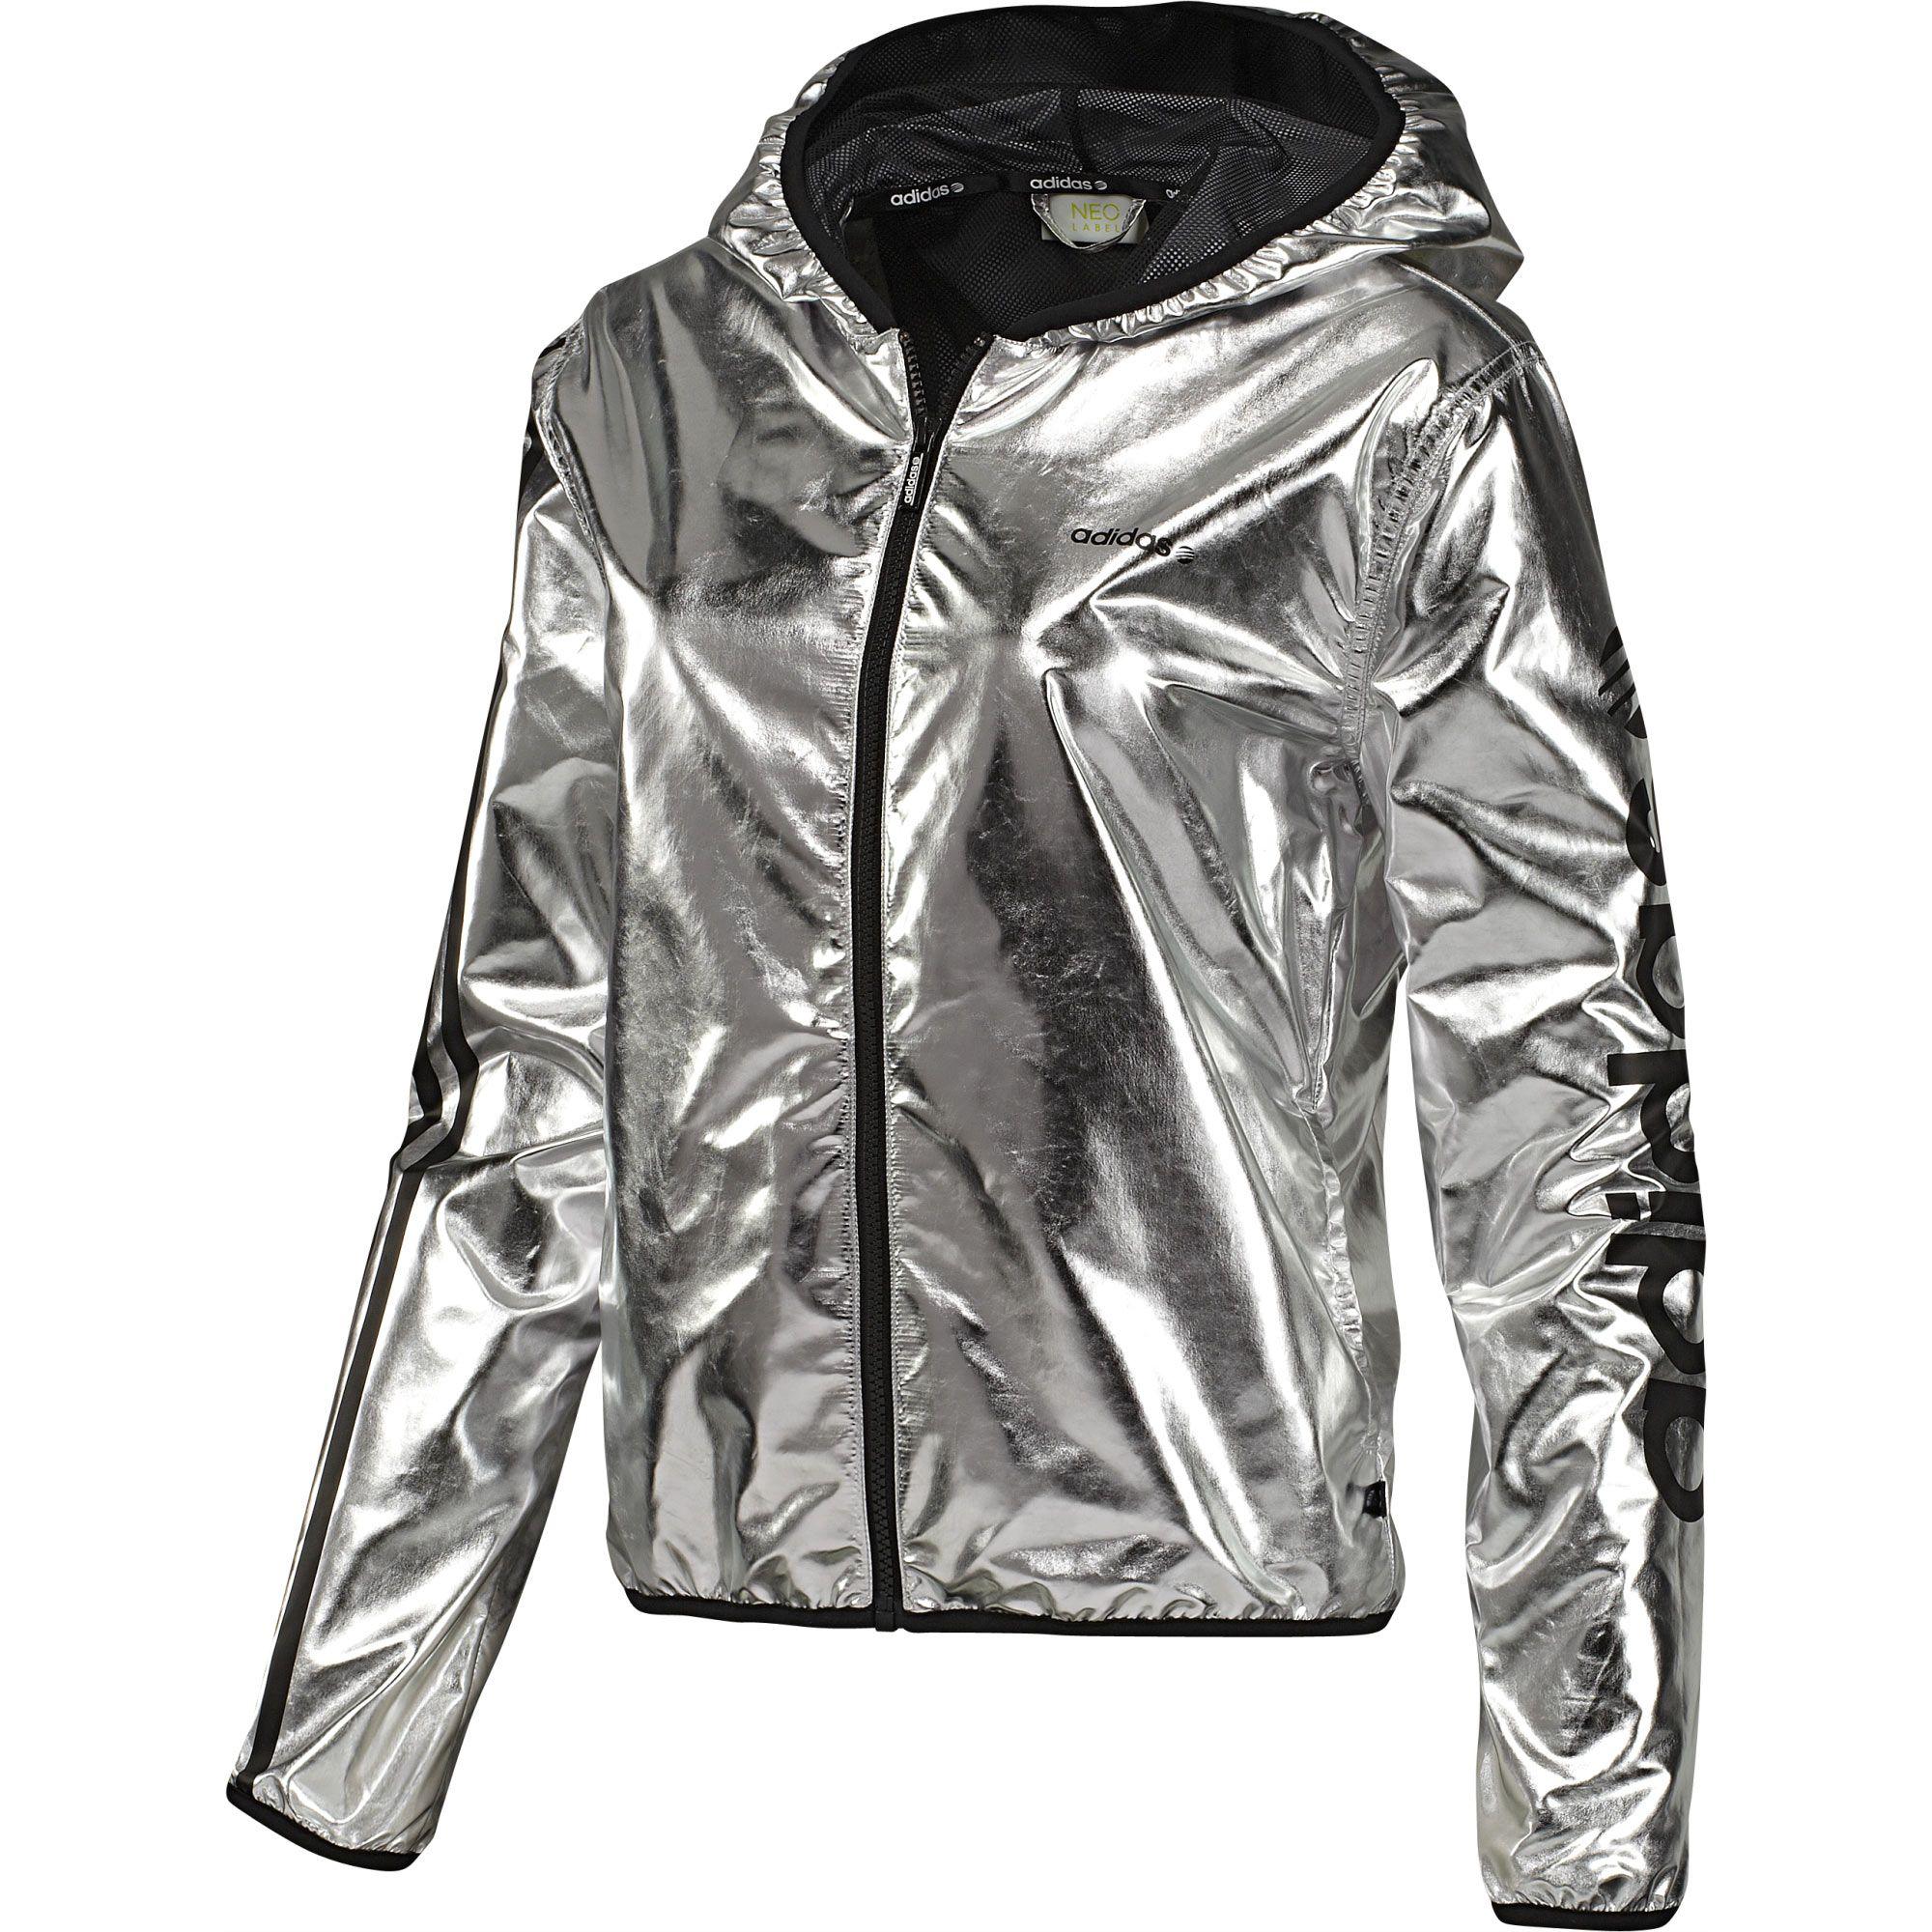 adidas silver windbreaker jacket